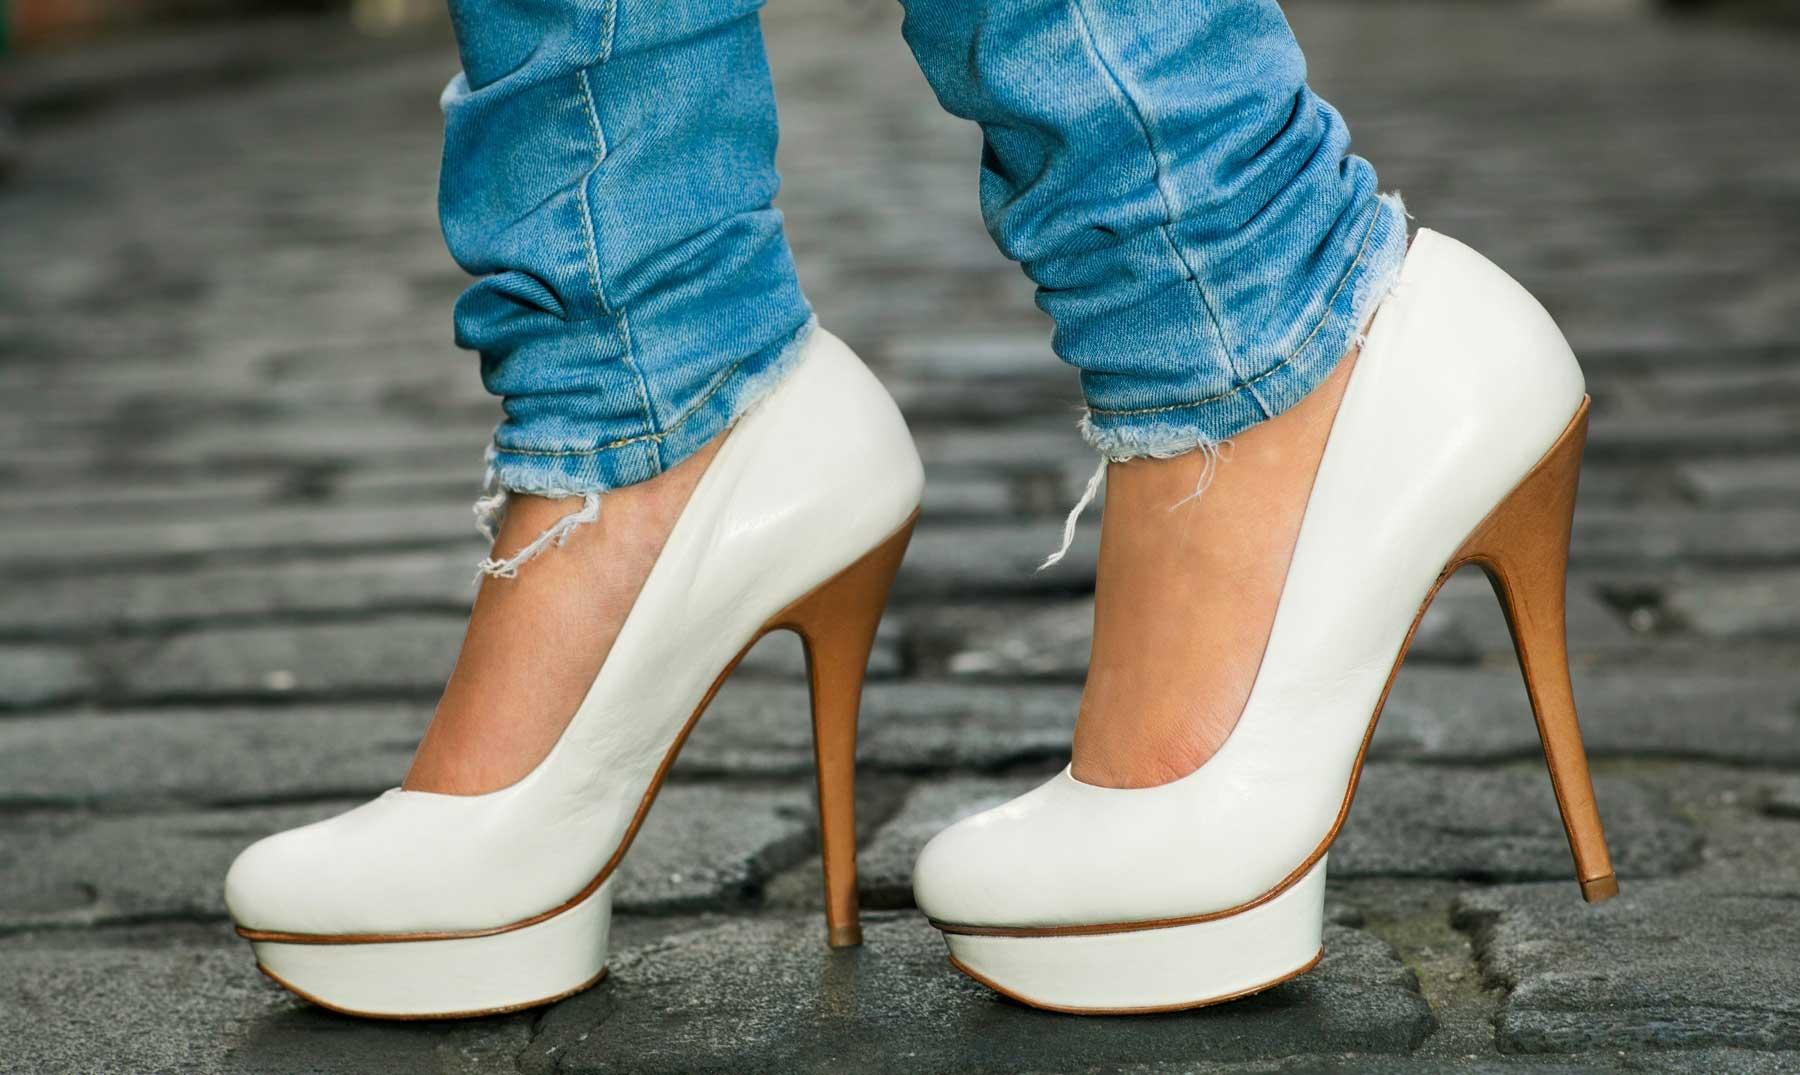 Zapatos, curiosos objetos